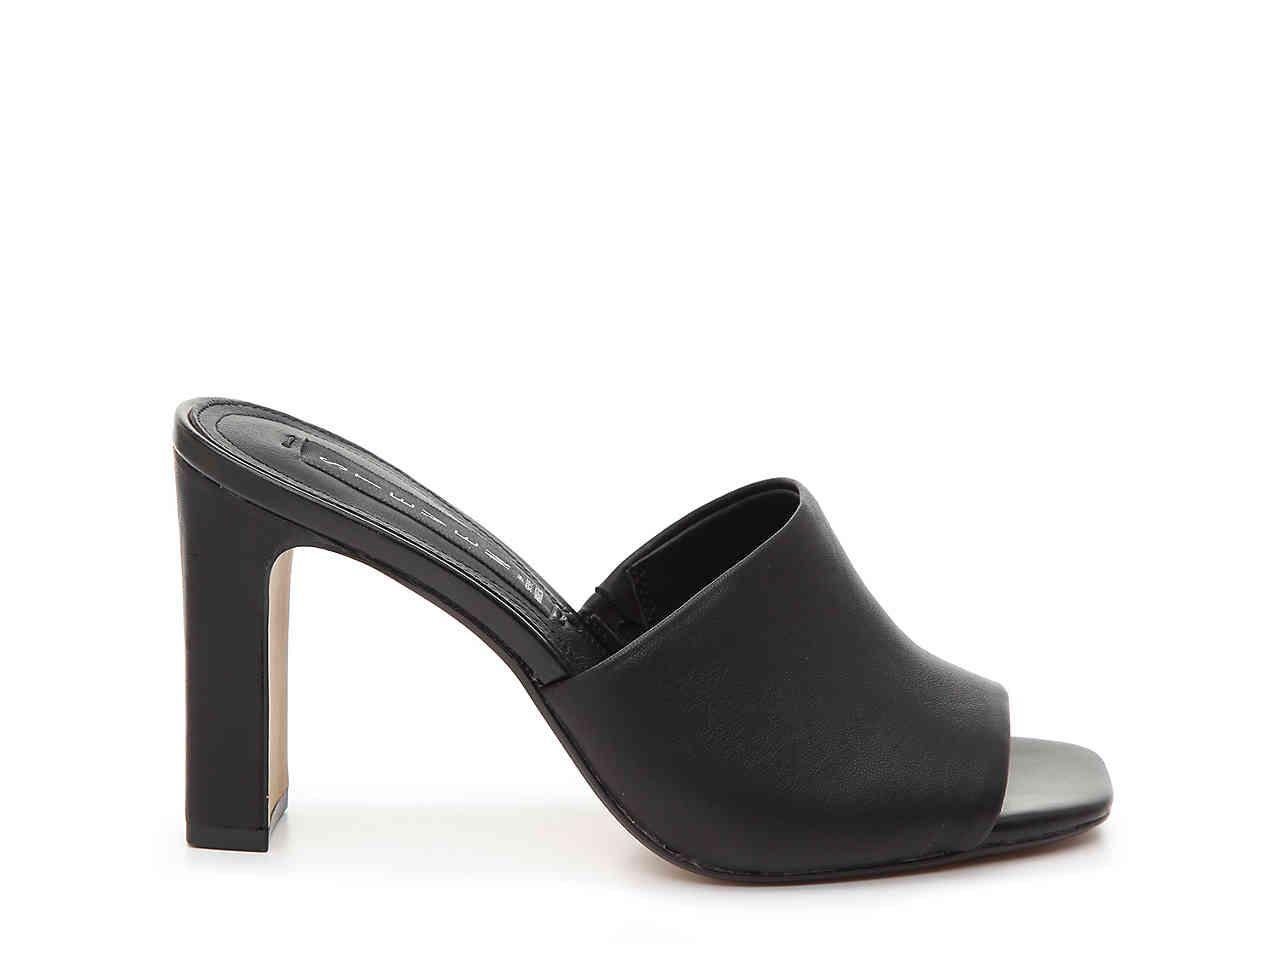 164d8d8f2c2 Women Joejo Sandal -White/Grey Snake Print Leather in 2019 | SHOES ...